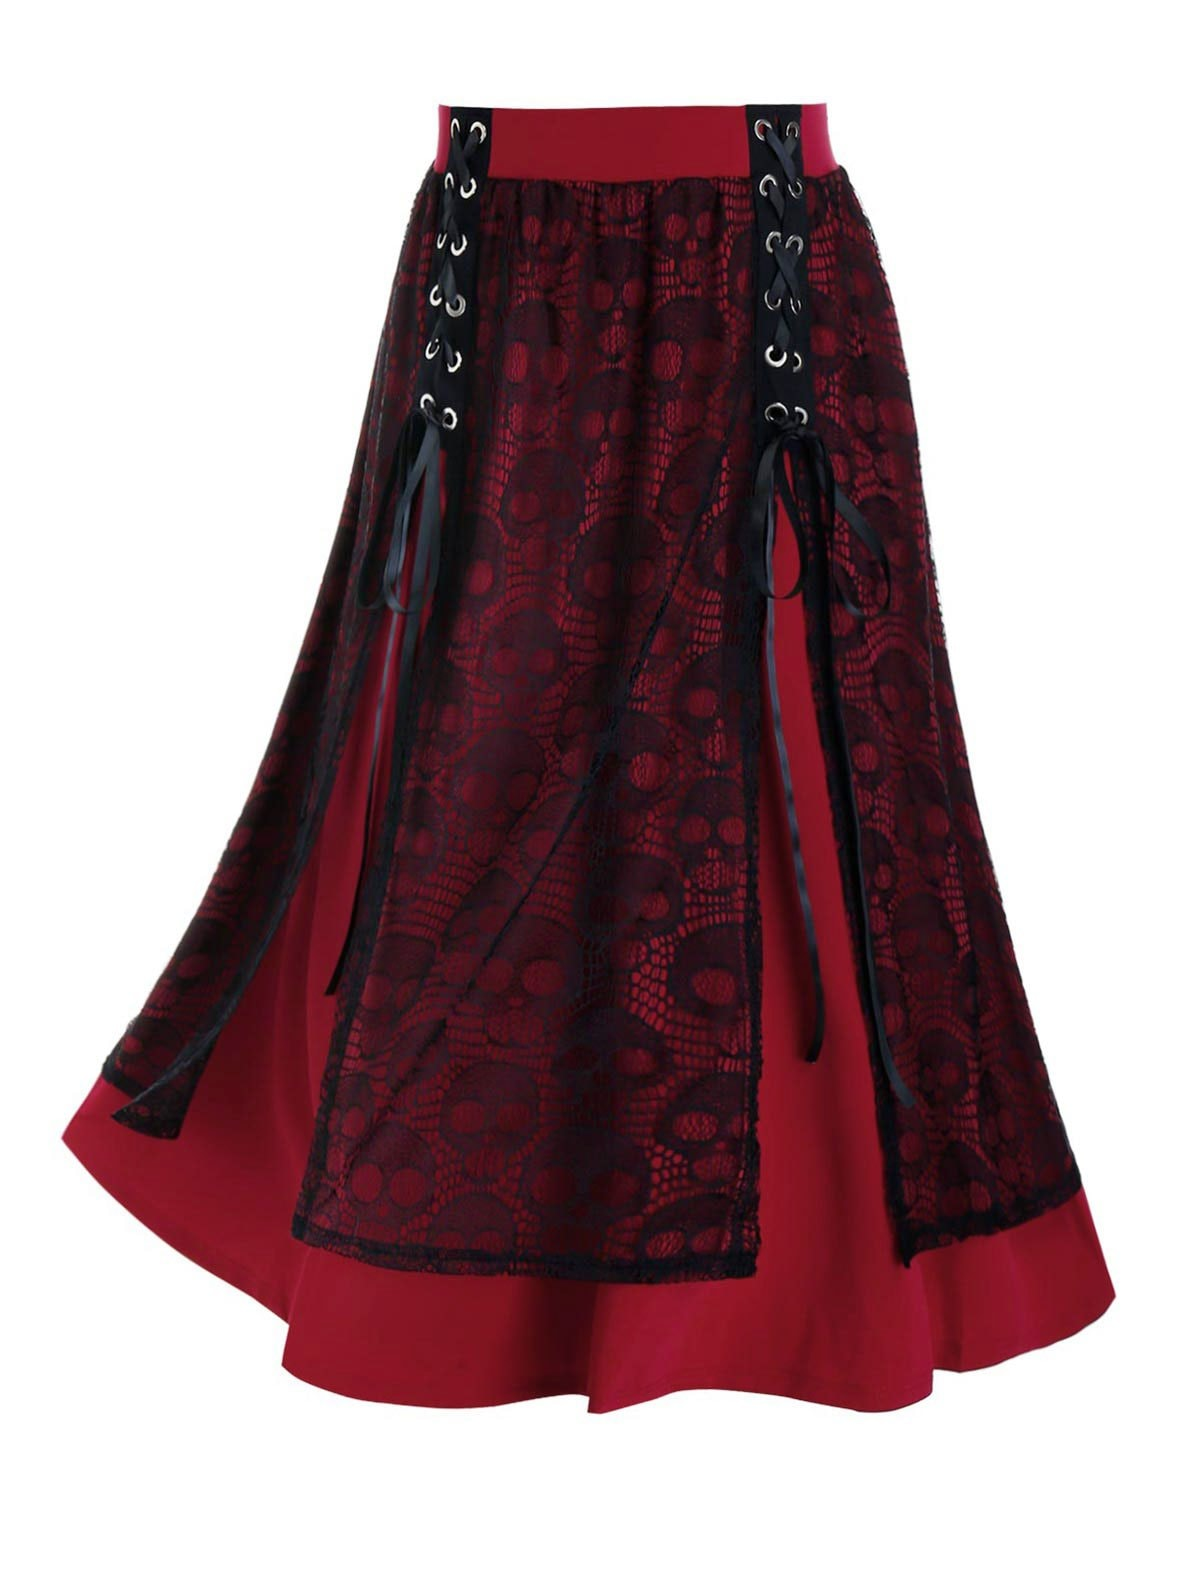 Plus Size Lace Skull Slit Grommet Lace-up Midi Skirt